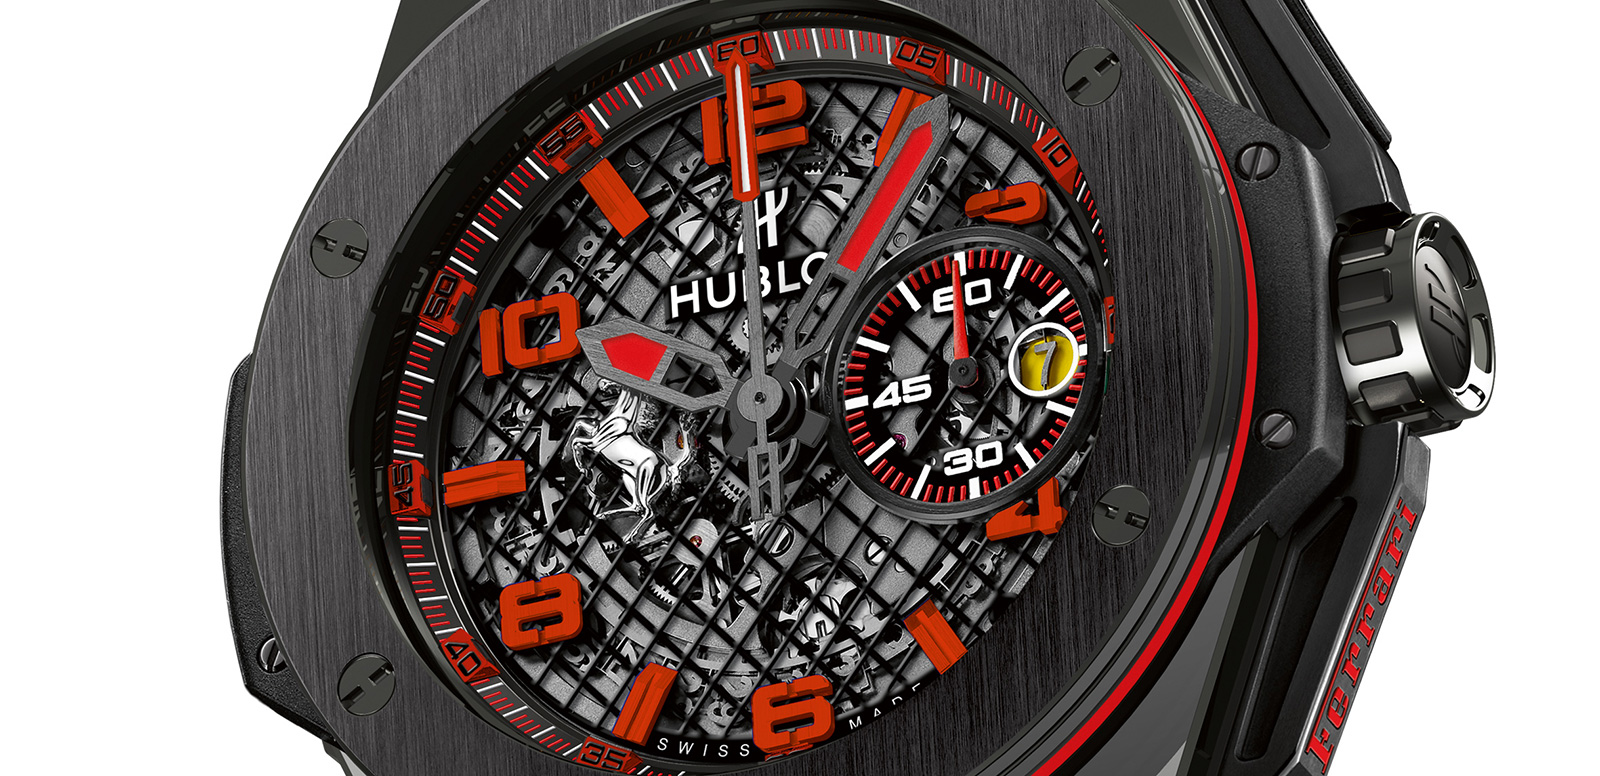 Hublot-Big-Bang-Ferrari-Black-Ceramic-2015